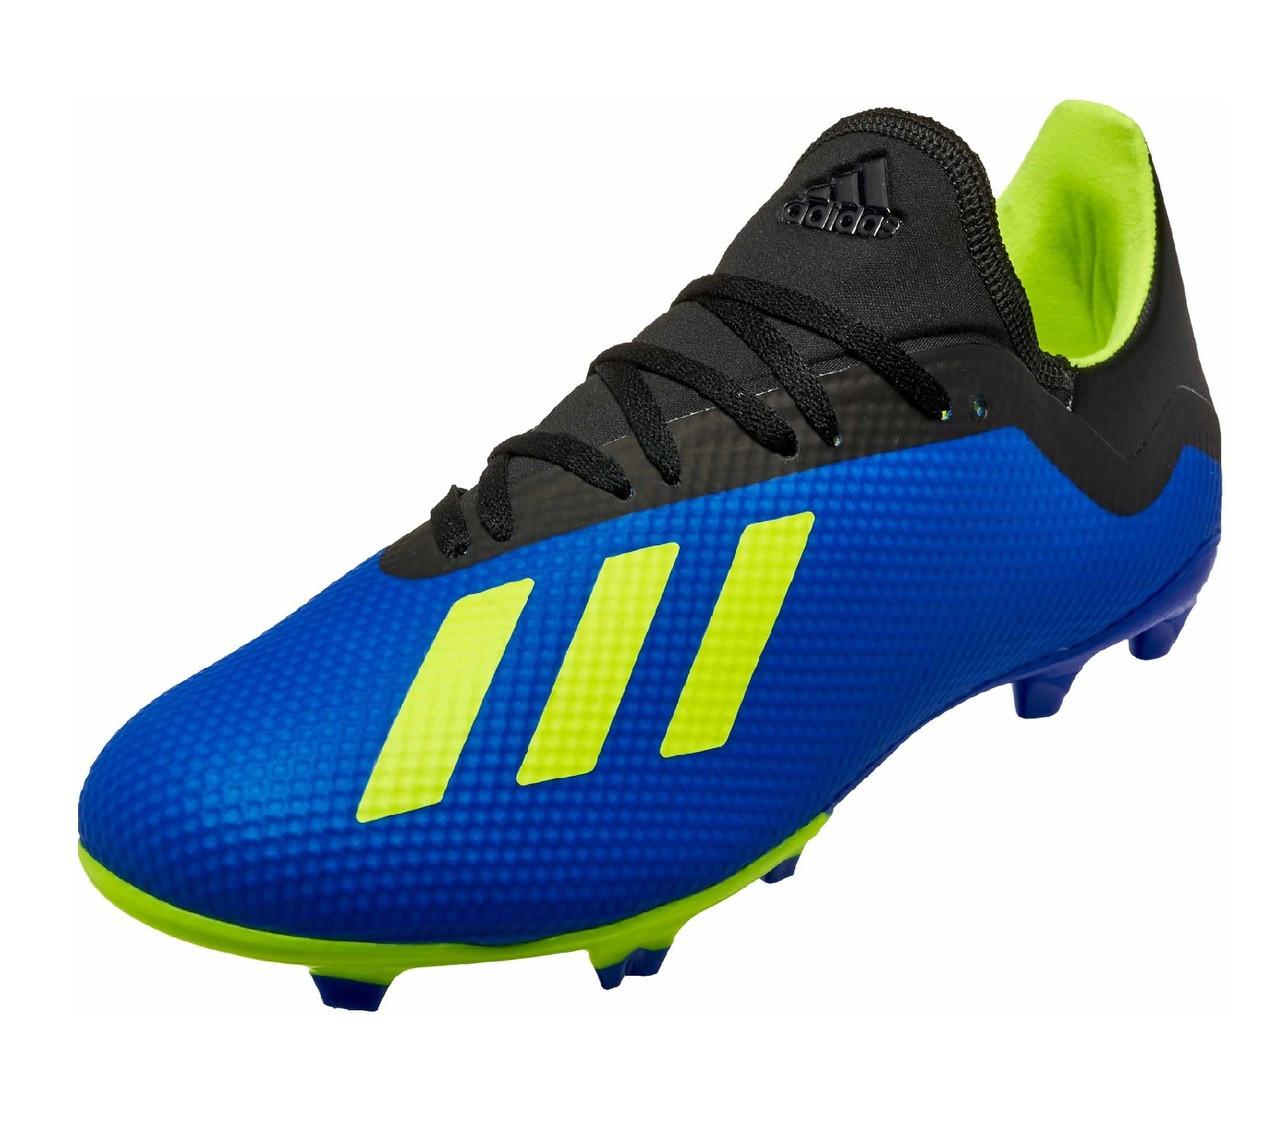 9fca14b2e Adidas X 18.3 FG - Football Blue  Solar Yellow Core Black (042319) - ohp  soccer